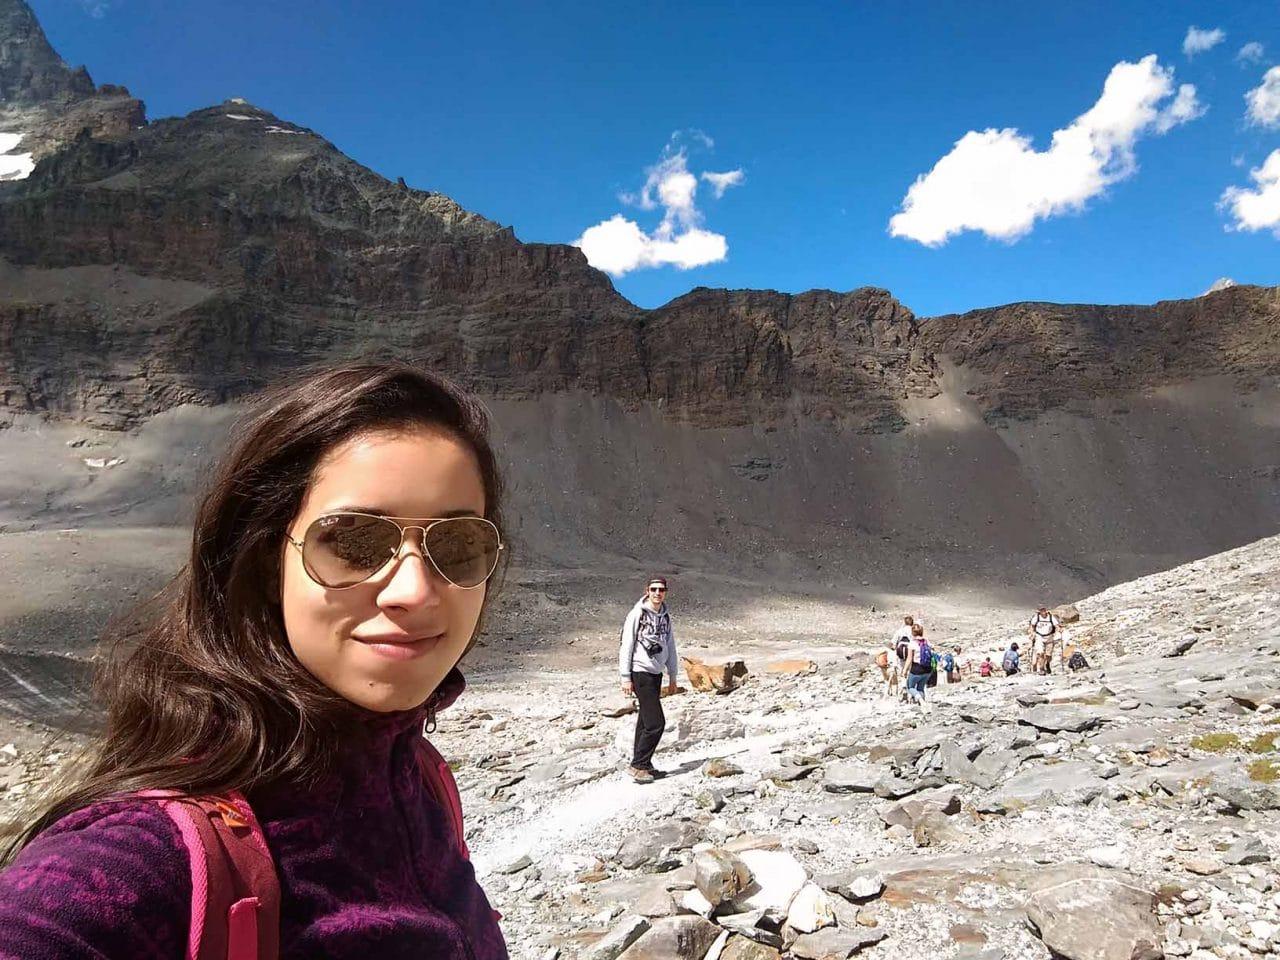 trilha da geleira zermatt